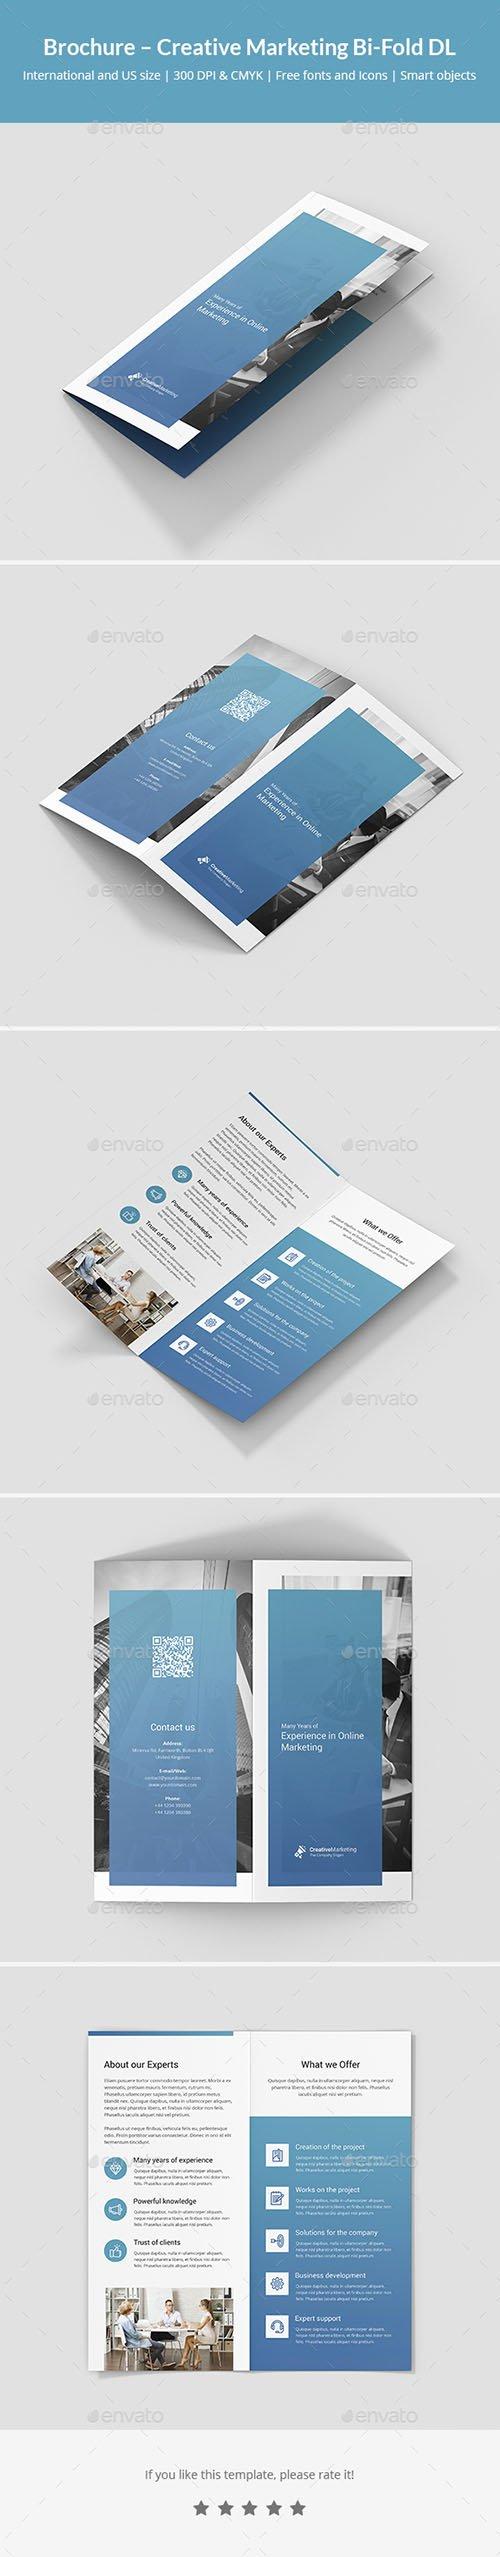 Brochure – Creative Marketing Bi-Fold DL 21403305